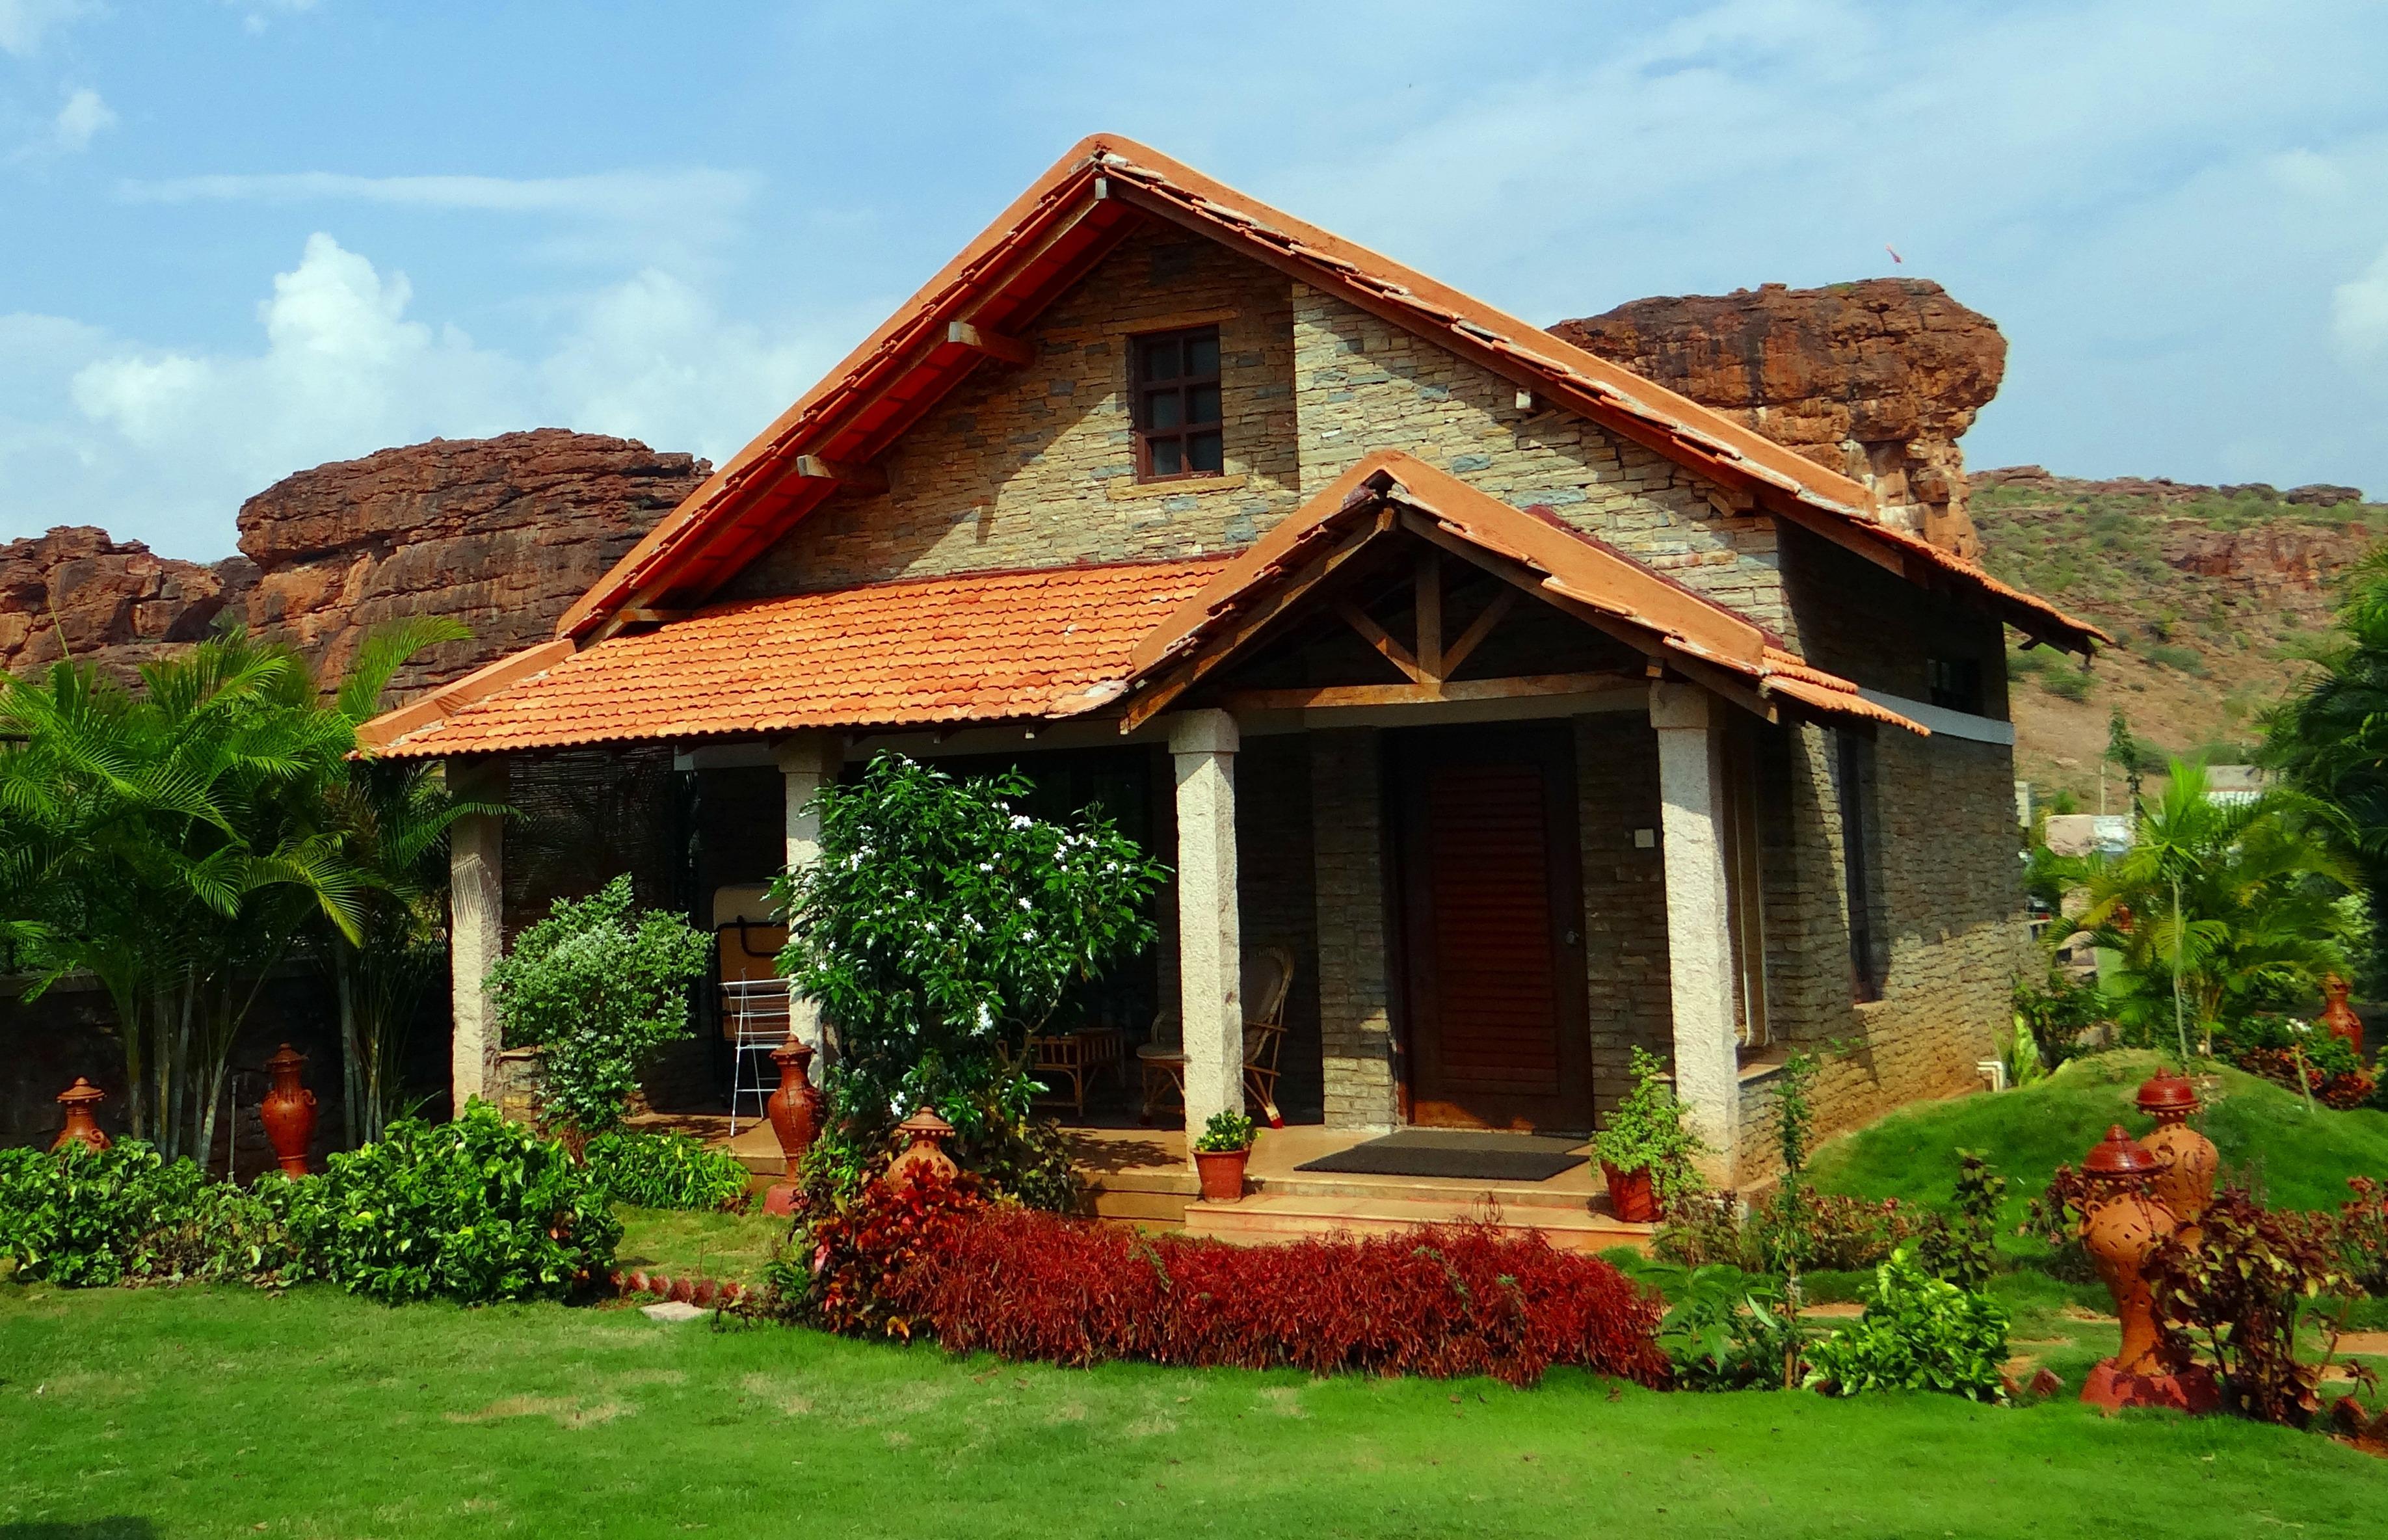 Free images villa house building sandstone cottage for Vacation log homes